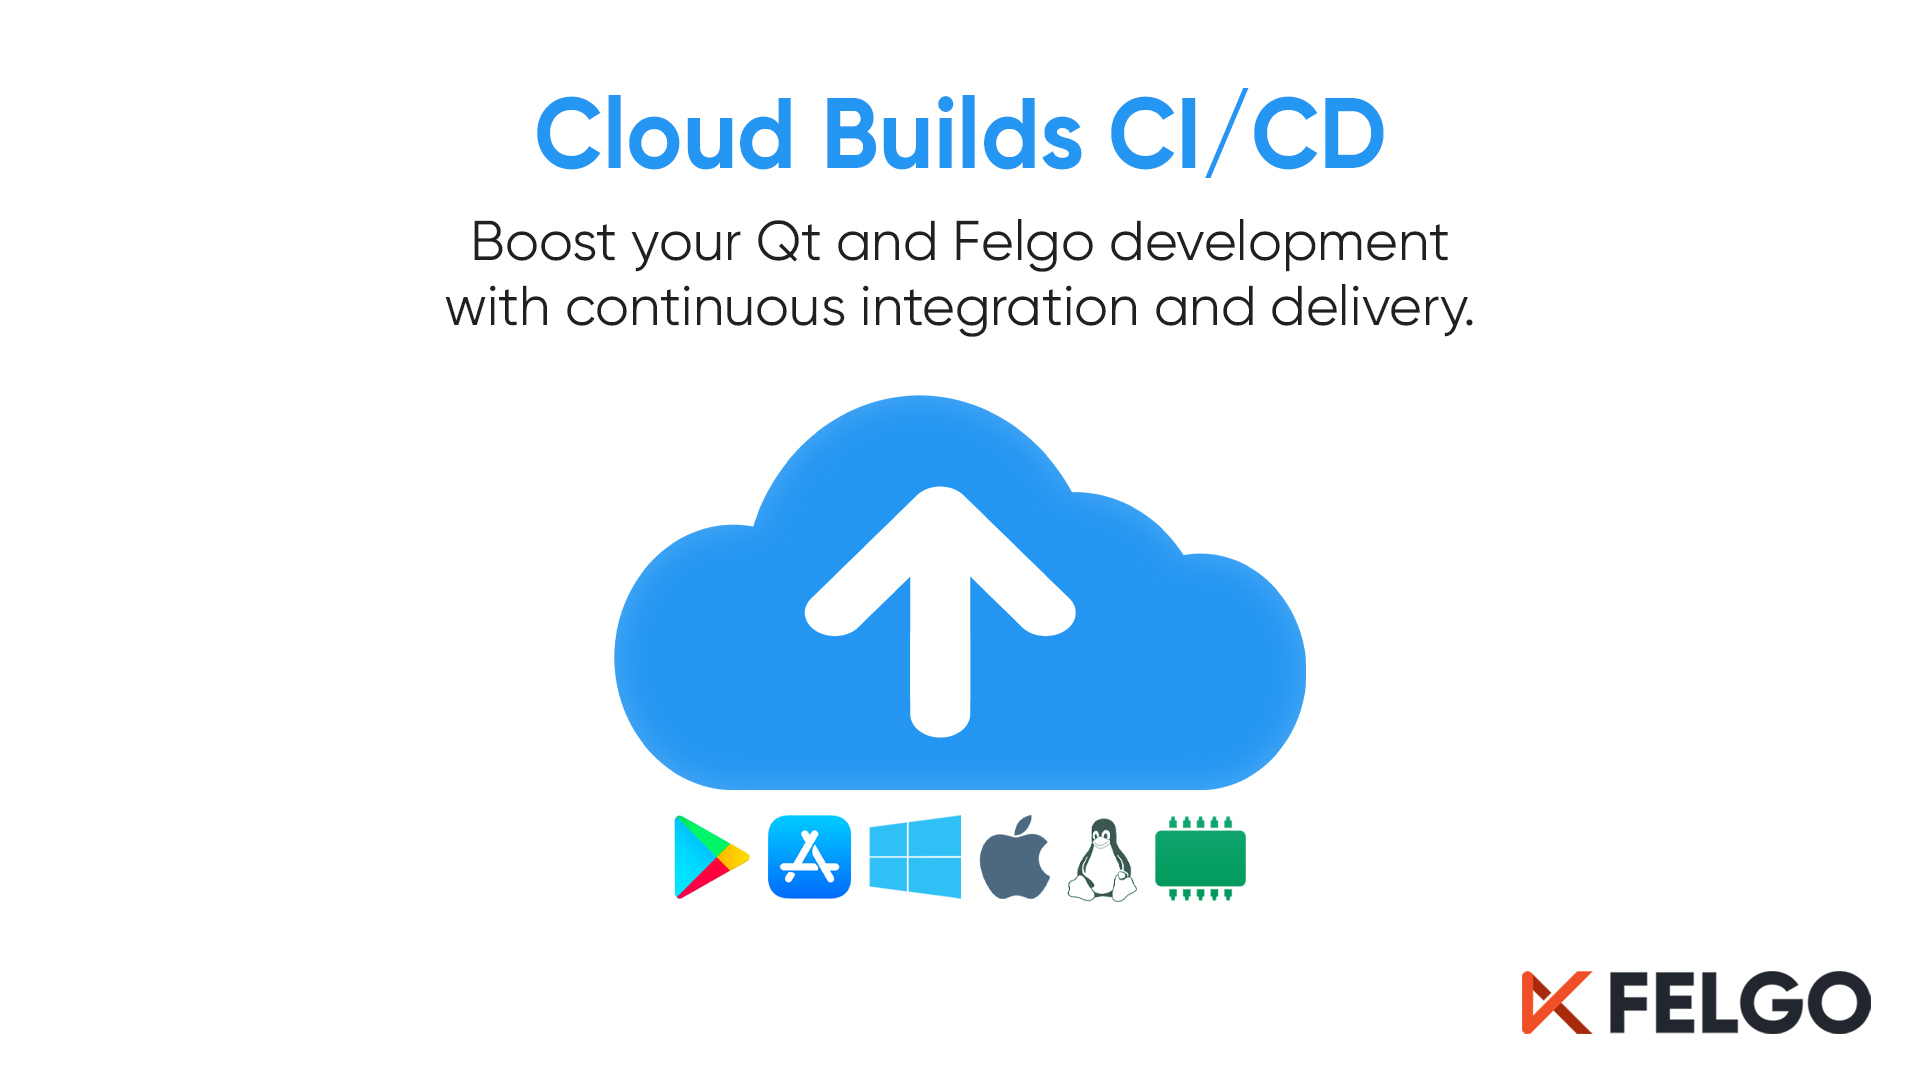 Felgo Cloud Builds